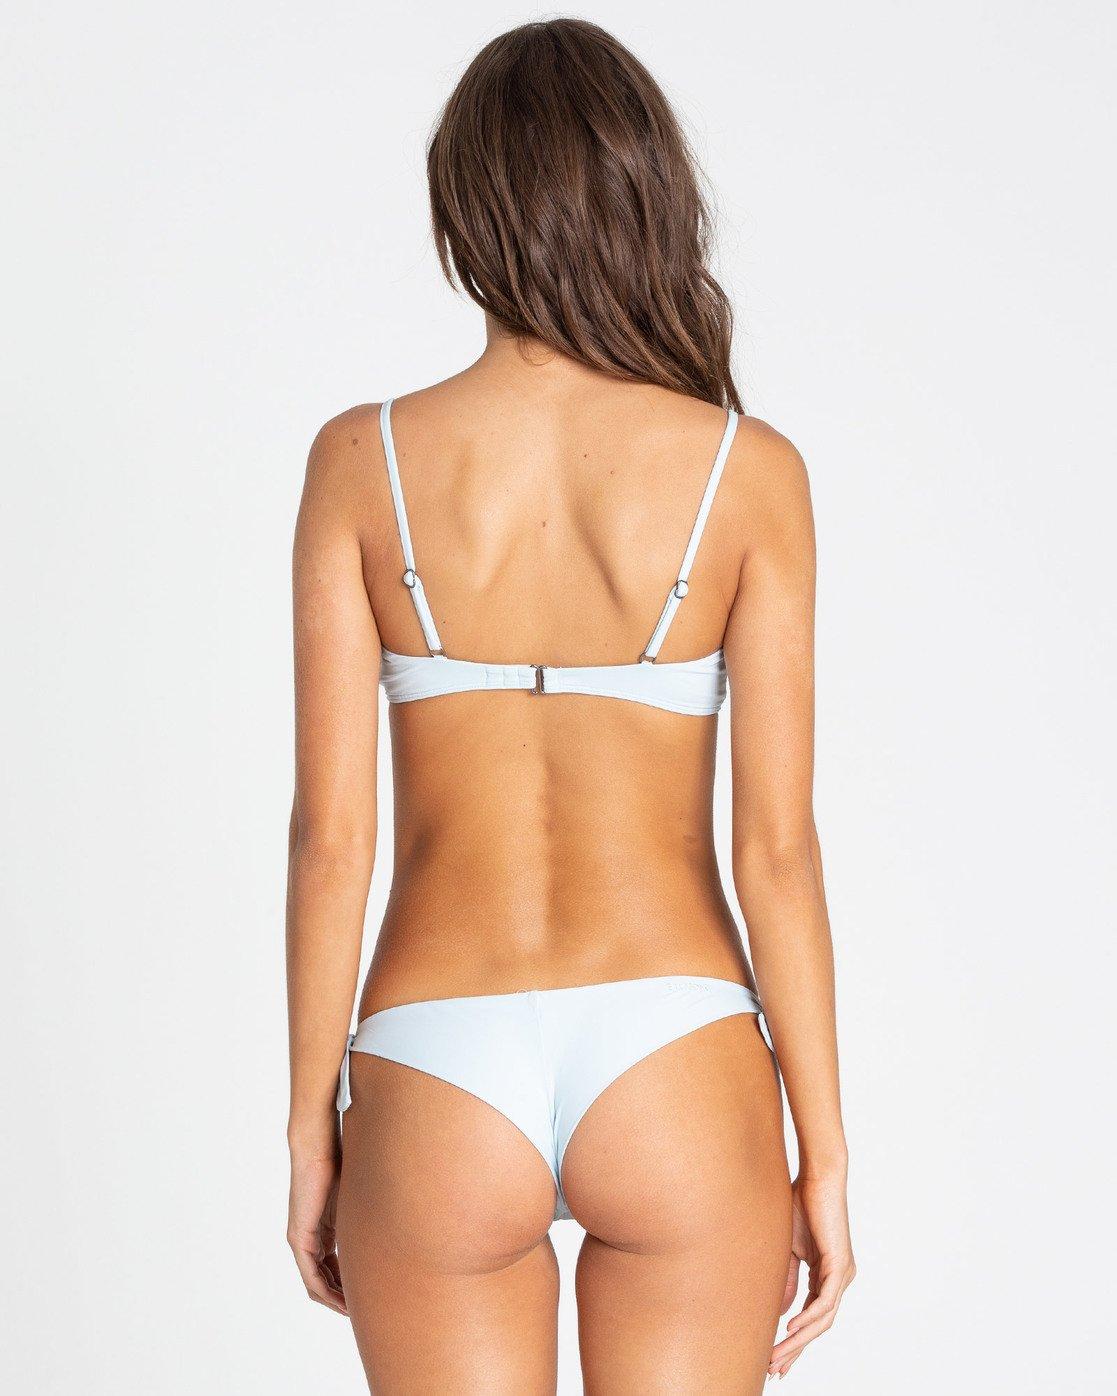 Billabong Sol Outil Twisted Bandeau Black Sands Bikini c3 sw05 bip7 3955